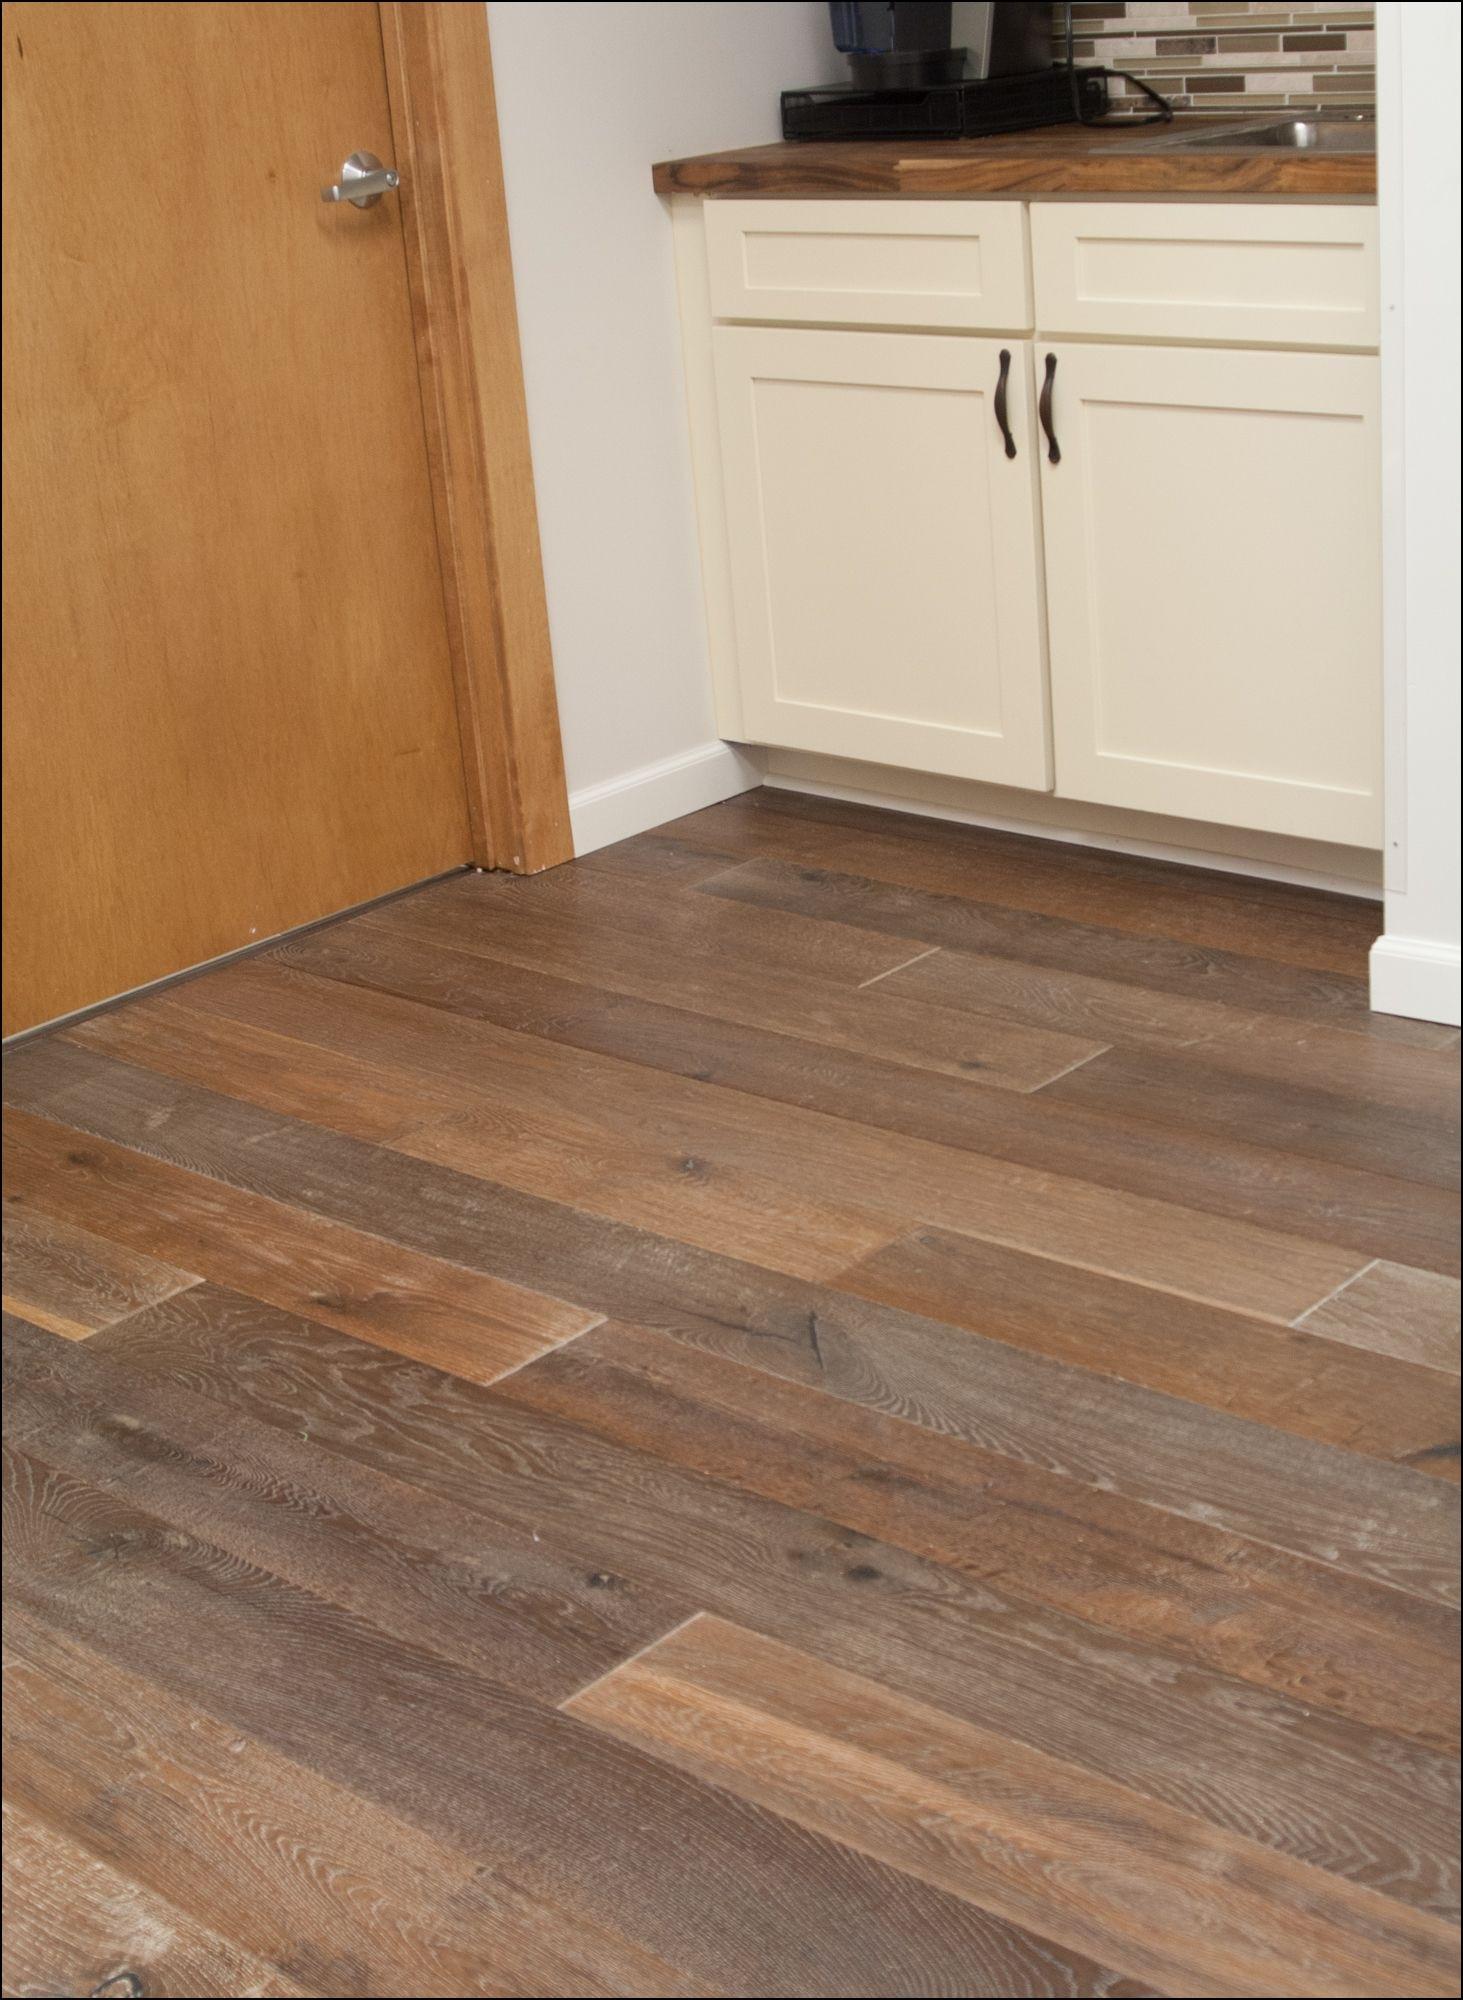 hardwood flooring oshawa of hardwood flooring suppliers france flooring ideas inside hardwood flooring pictures in homes stock vintage white oak costa hardwood floor home ideas of hardwood